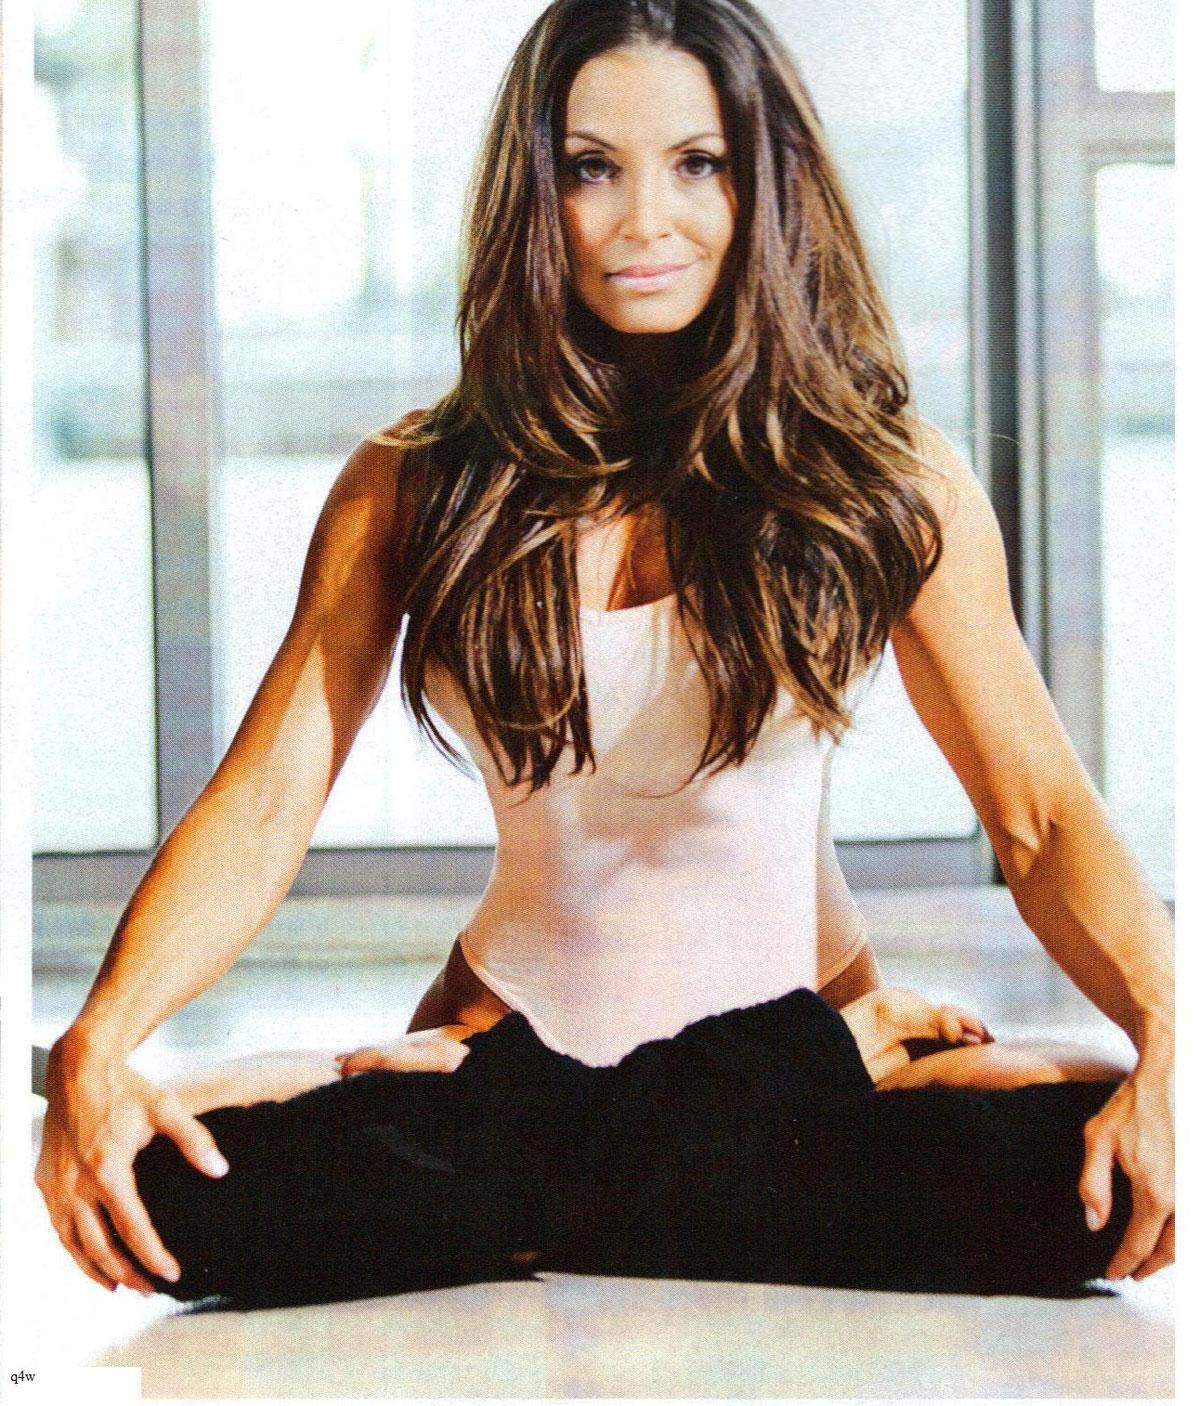 Wallpaper Girls In Yogapants Trish Stratus Inside Fitness 15 Gotceleb